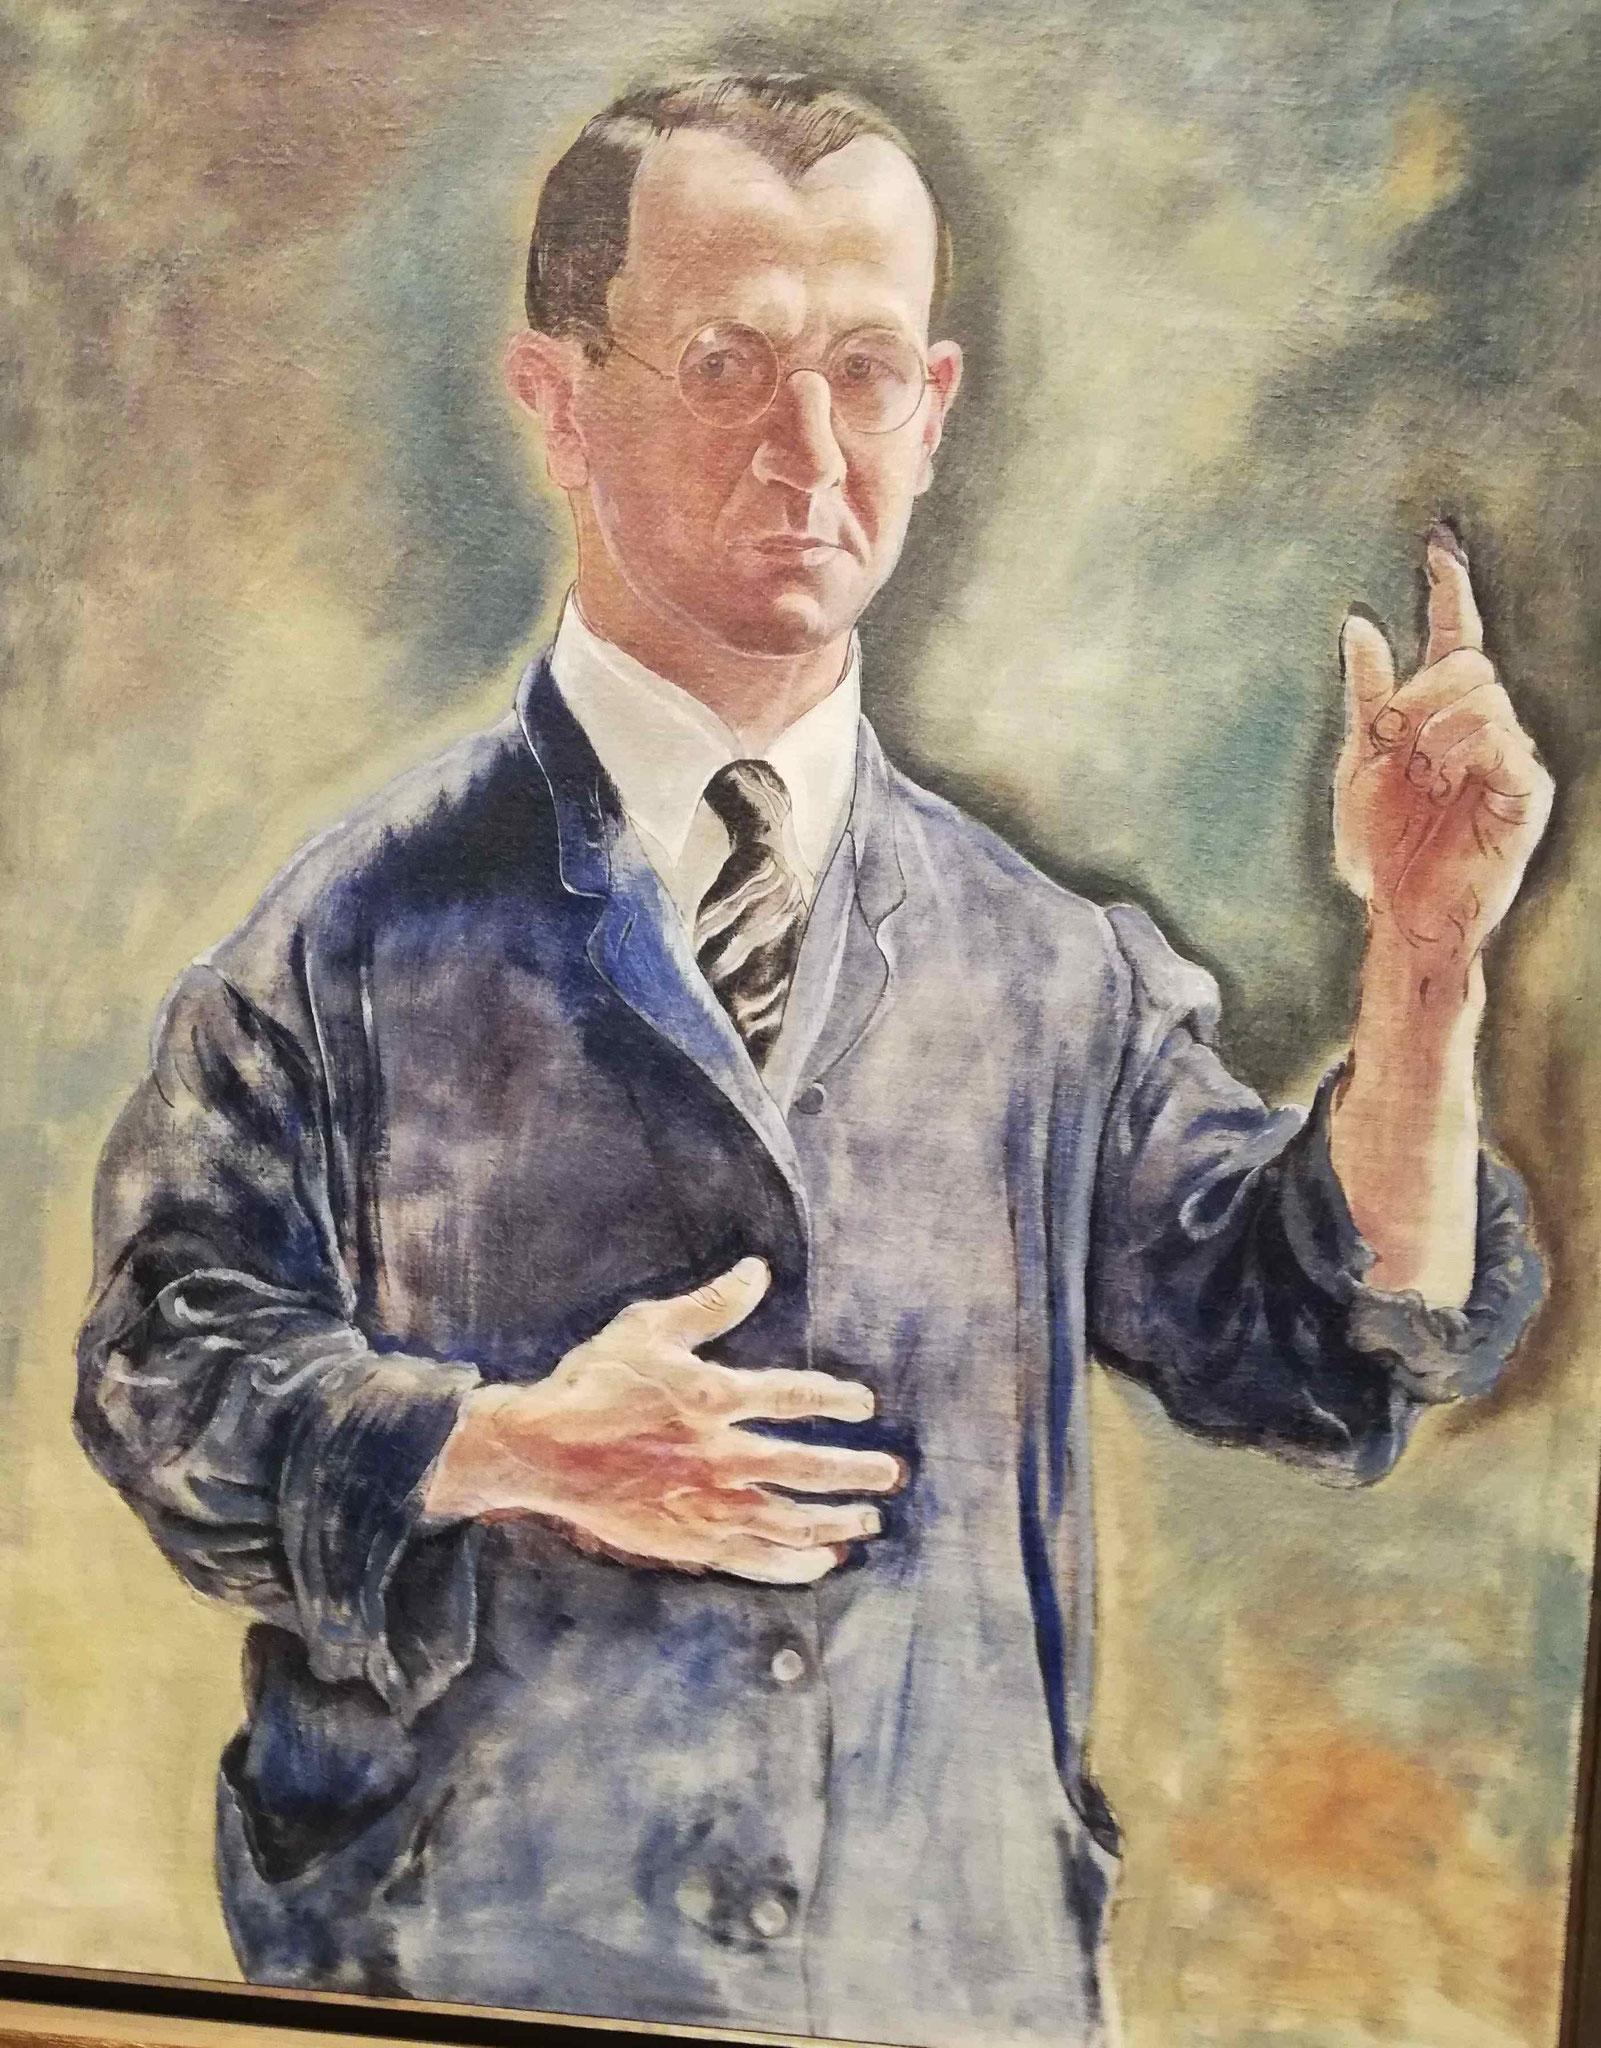 George Grosz, Selbstbildnis als Warner, 1927